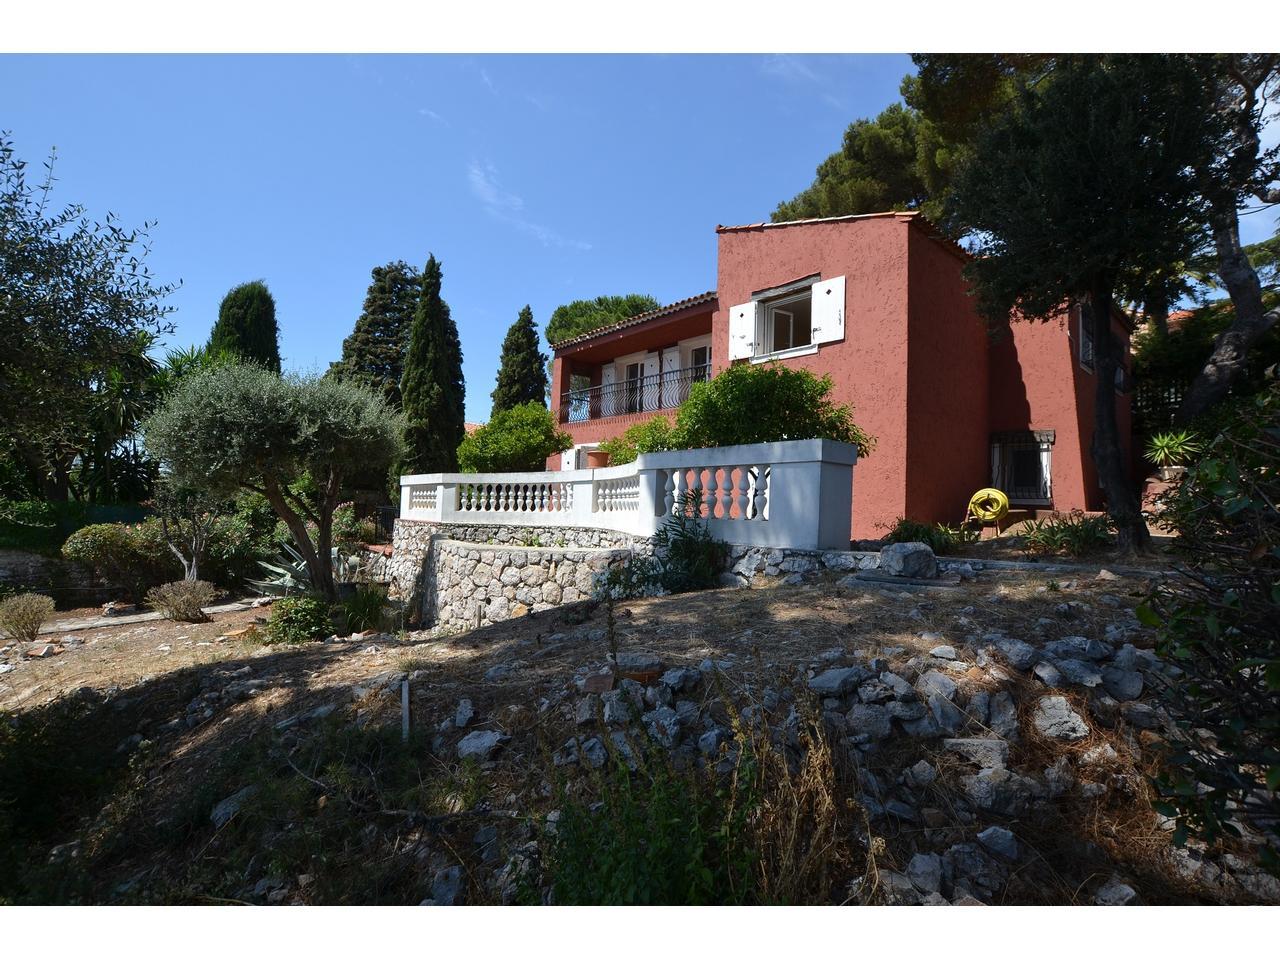 Immobilier nice vue mer maison villefranche sur mer villa maison vue mer a vendre terrain plat - Piscine pente terrain nice ...